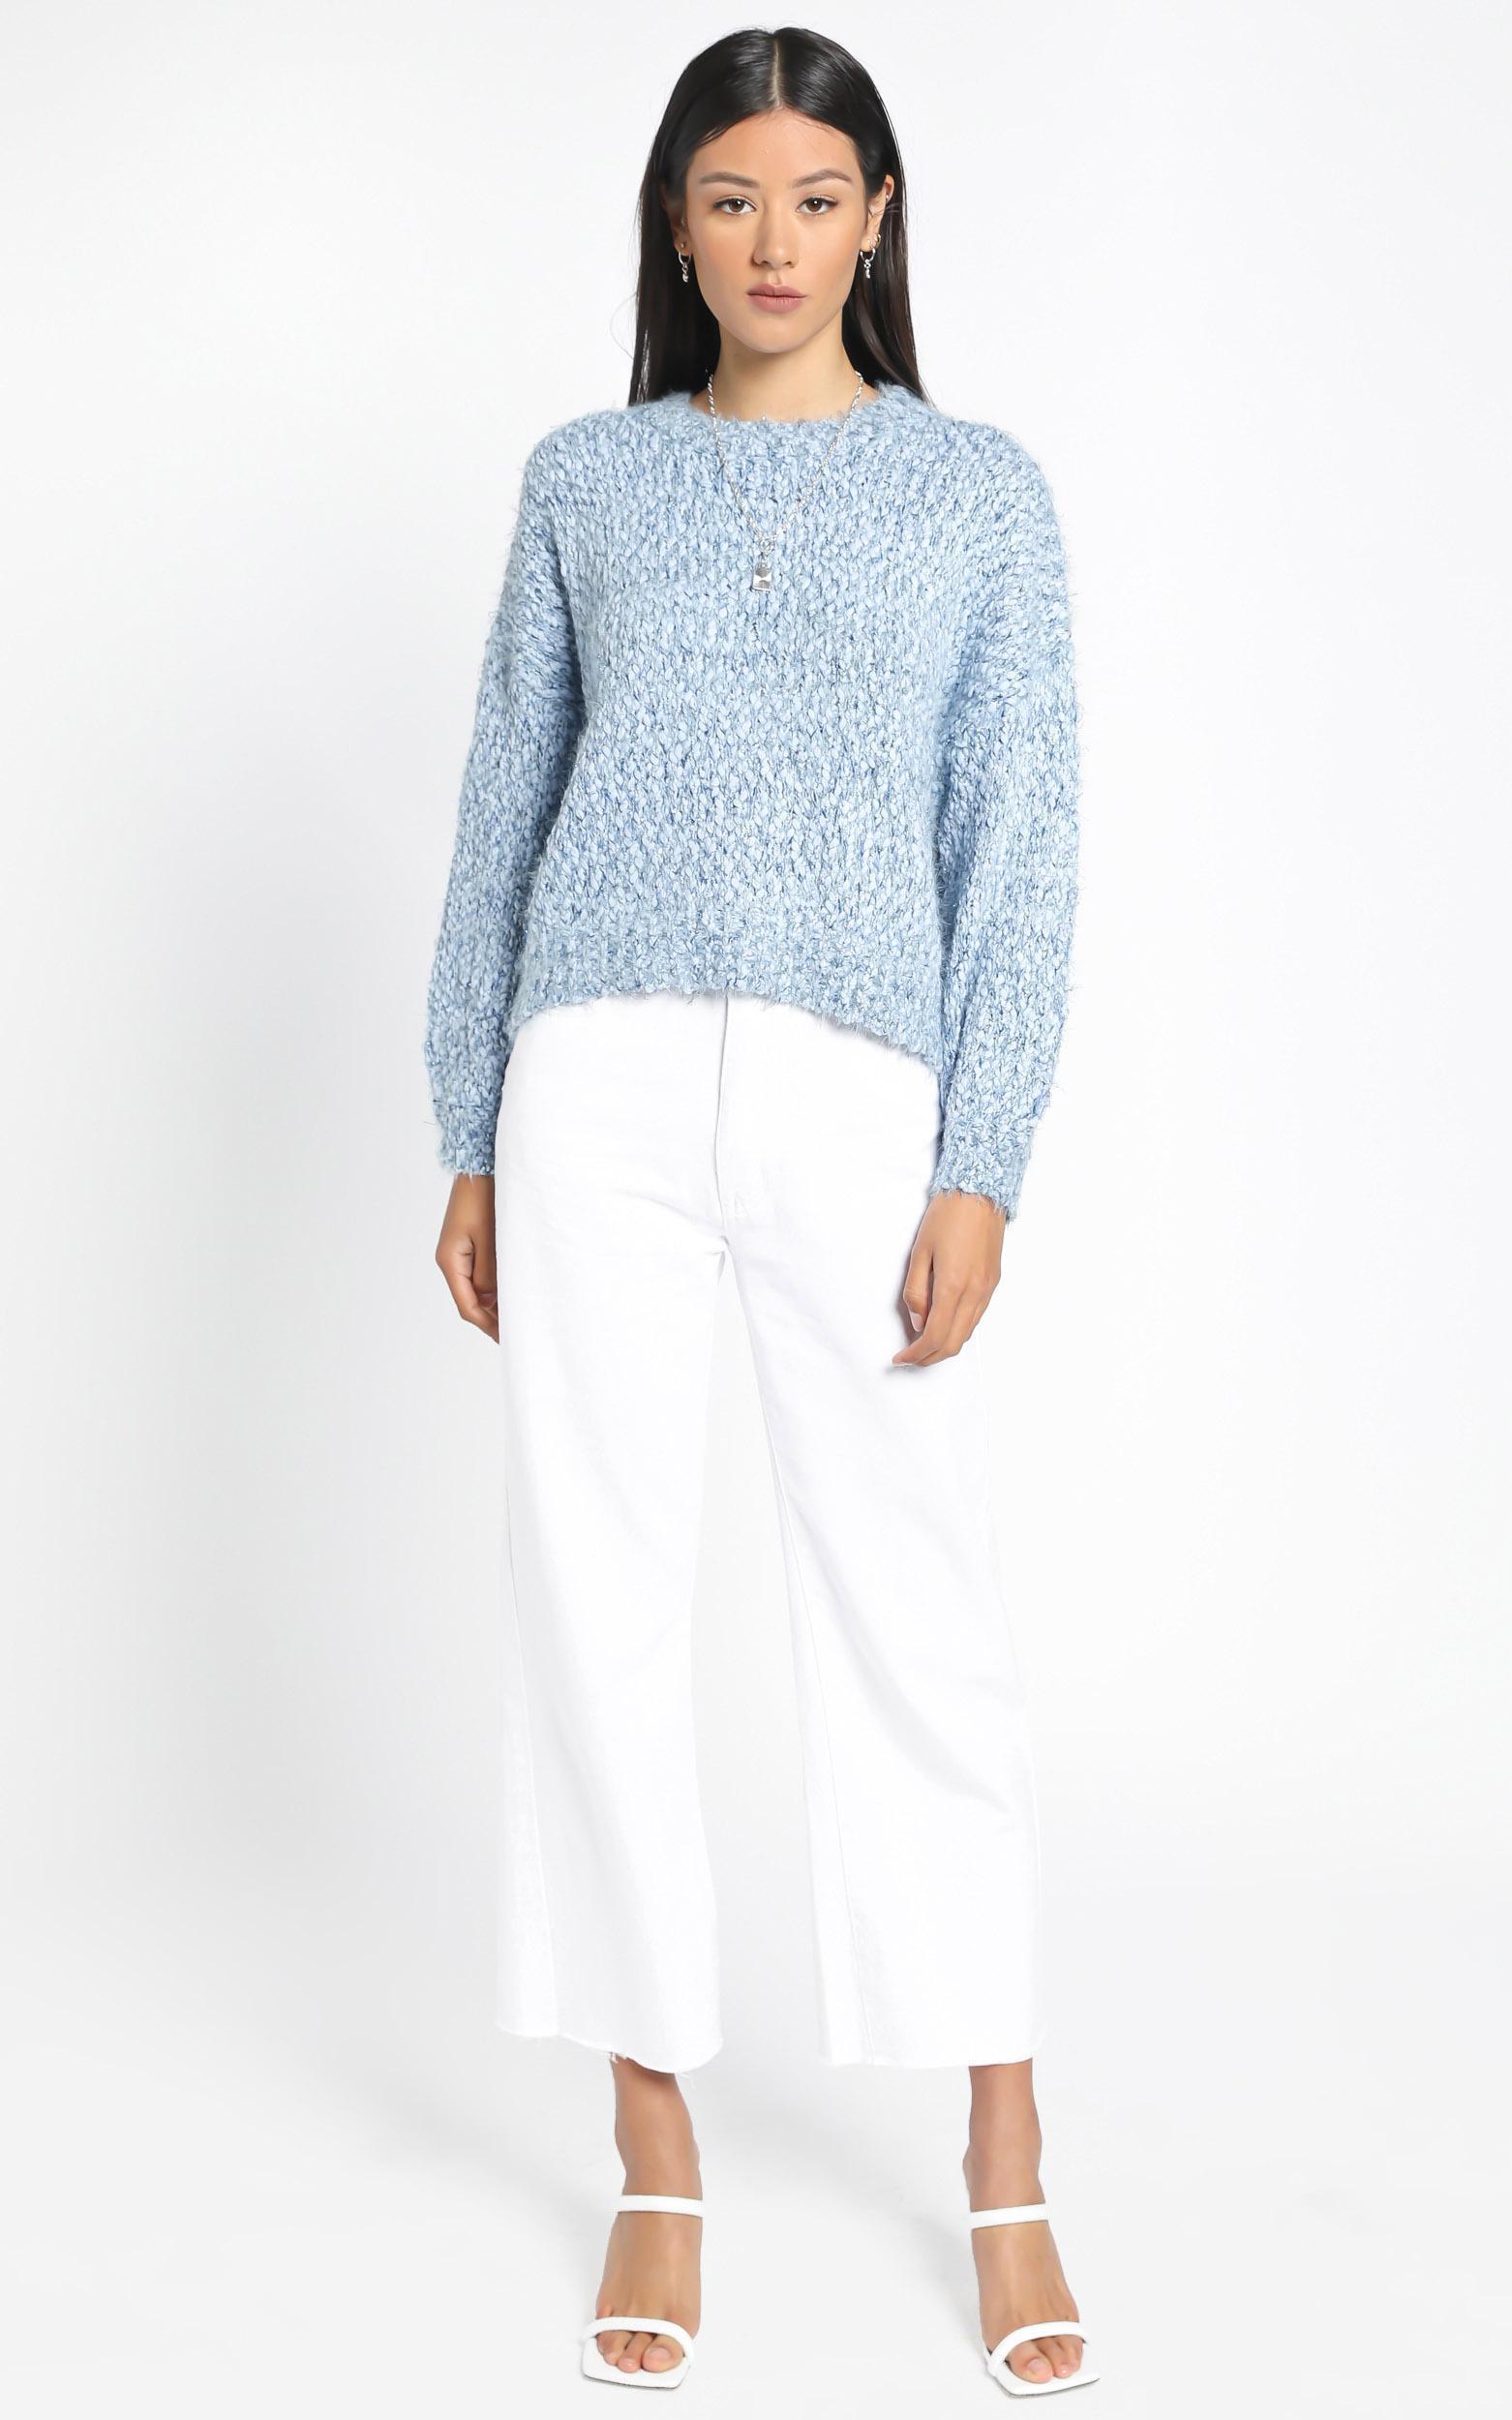 Gwyneth Jumper in Blue Marle - M/L, Blue, hi-res image number null